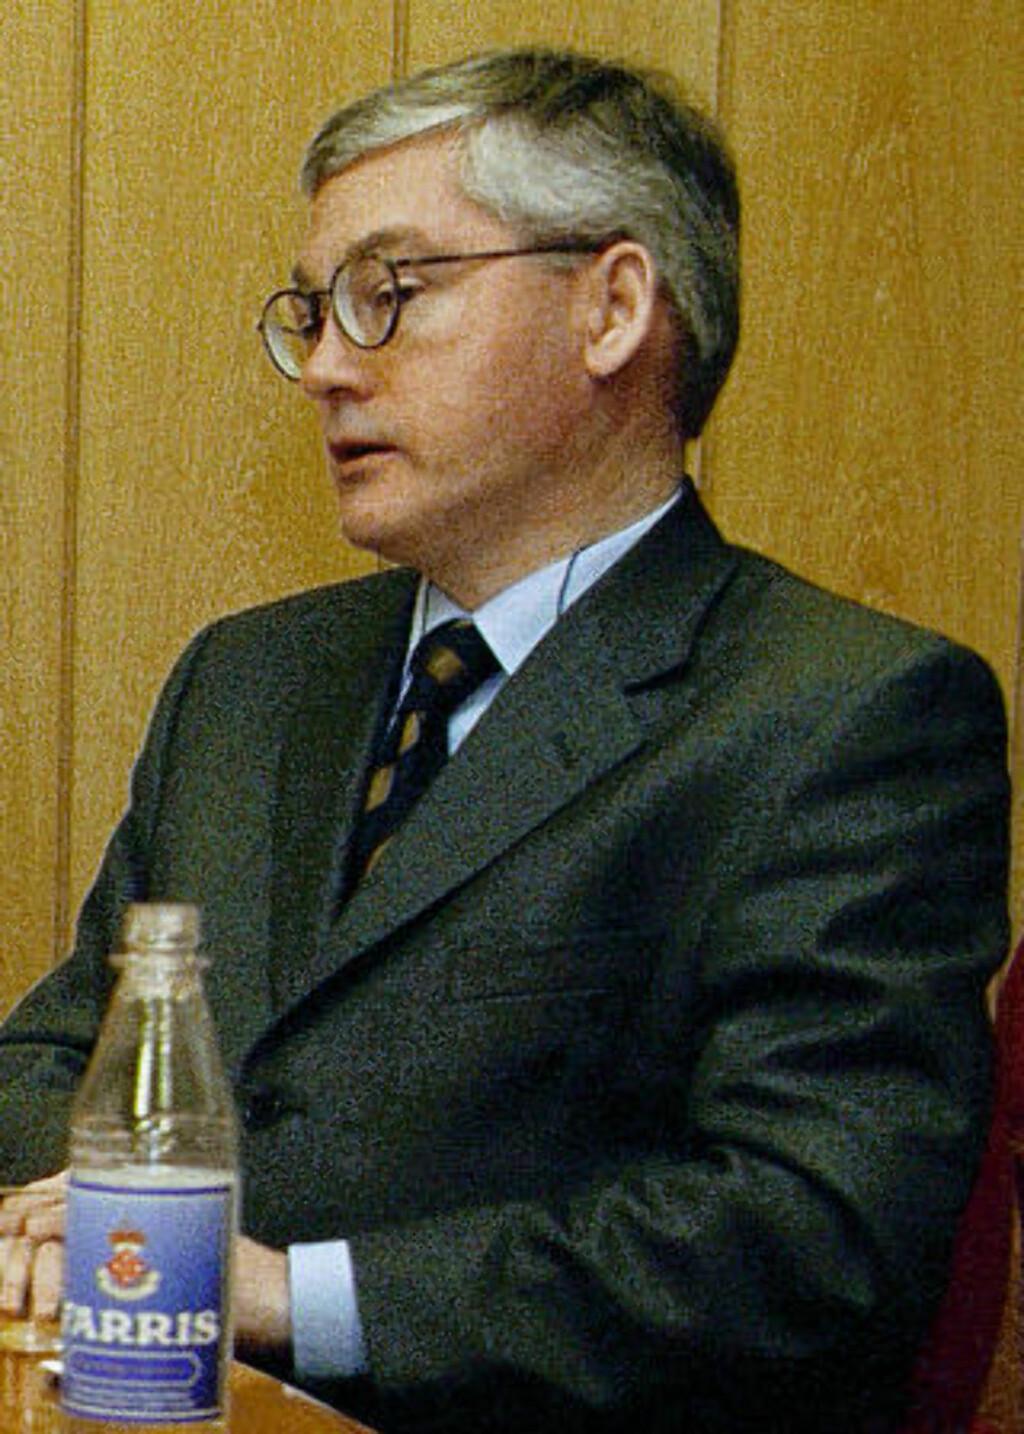 LEDET UTVALGET: Spesialrådgiver og tidligere departementsråd John Lunde. Foto: Forsvaret